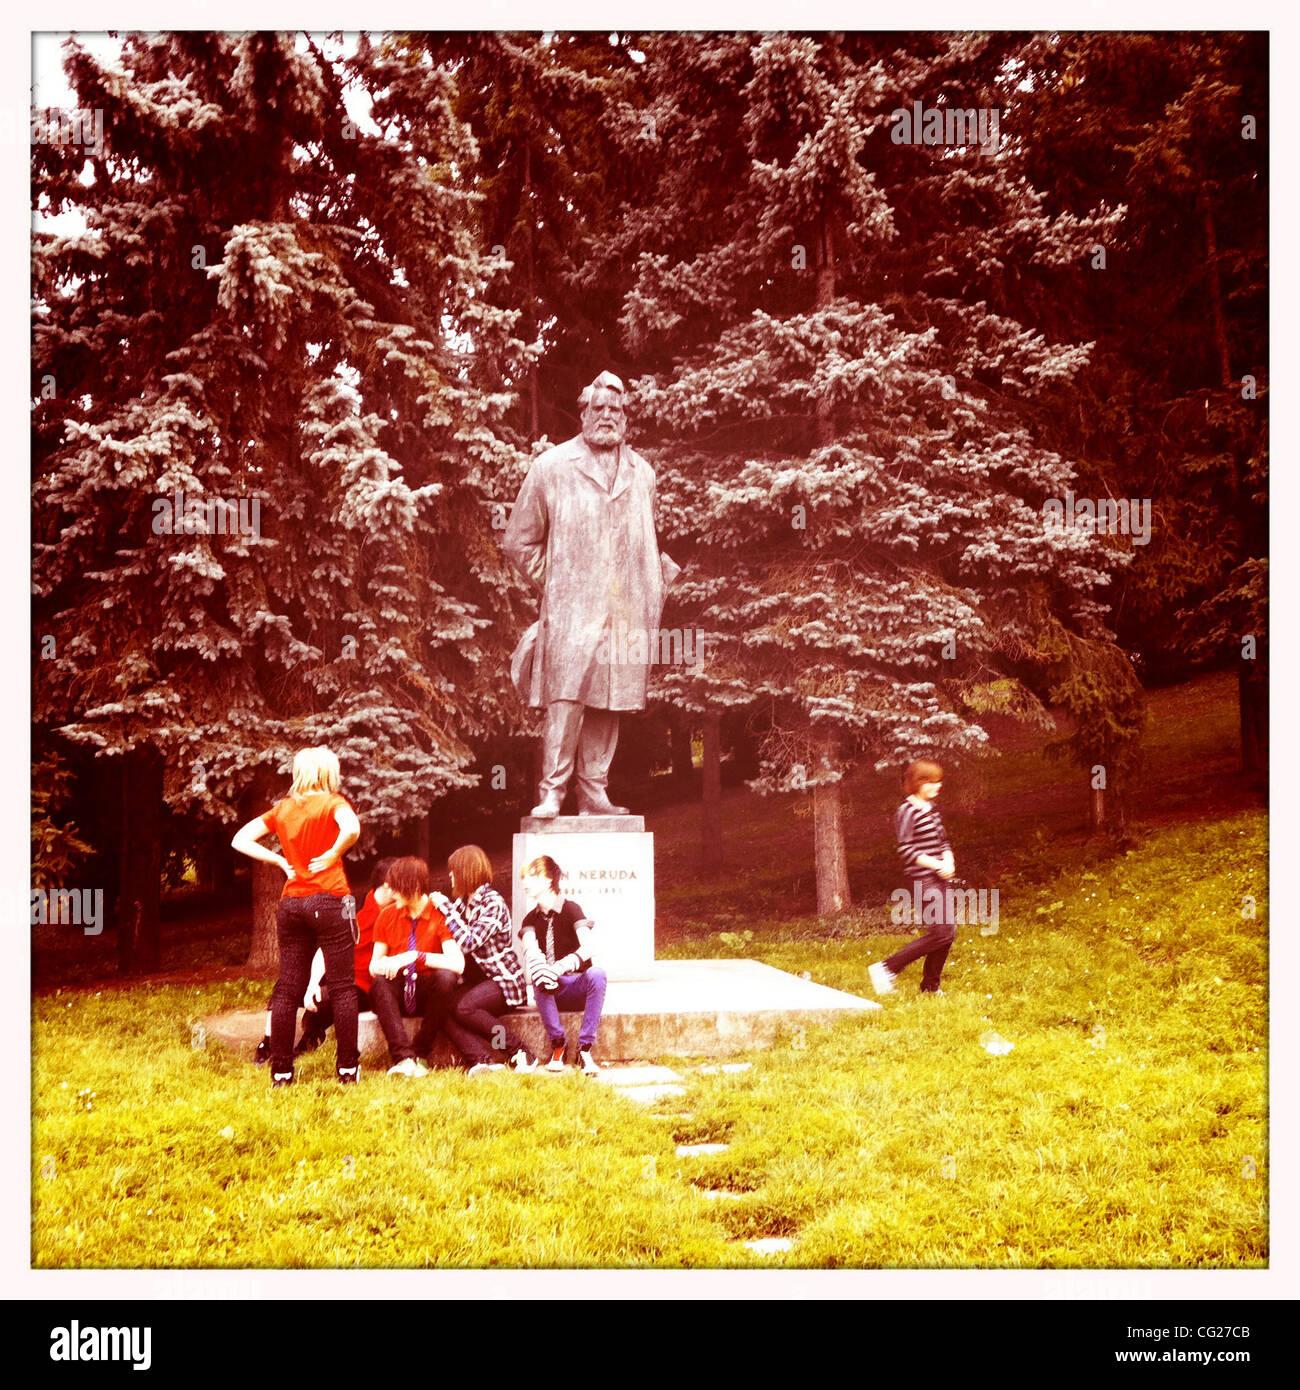 Aug. 11, 2011 - Prague, Czech Republic - Statue of Karel Hynek Macha, revered Czech poet of the Romantic era, mostly - Stock Image